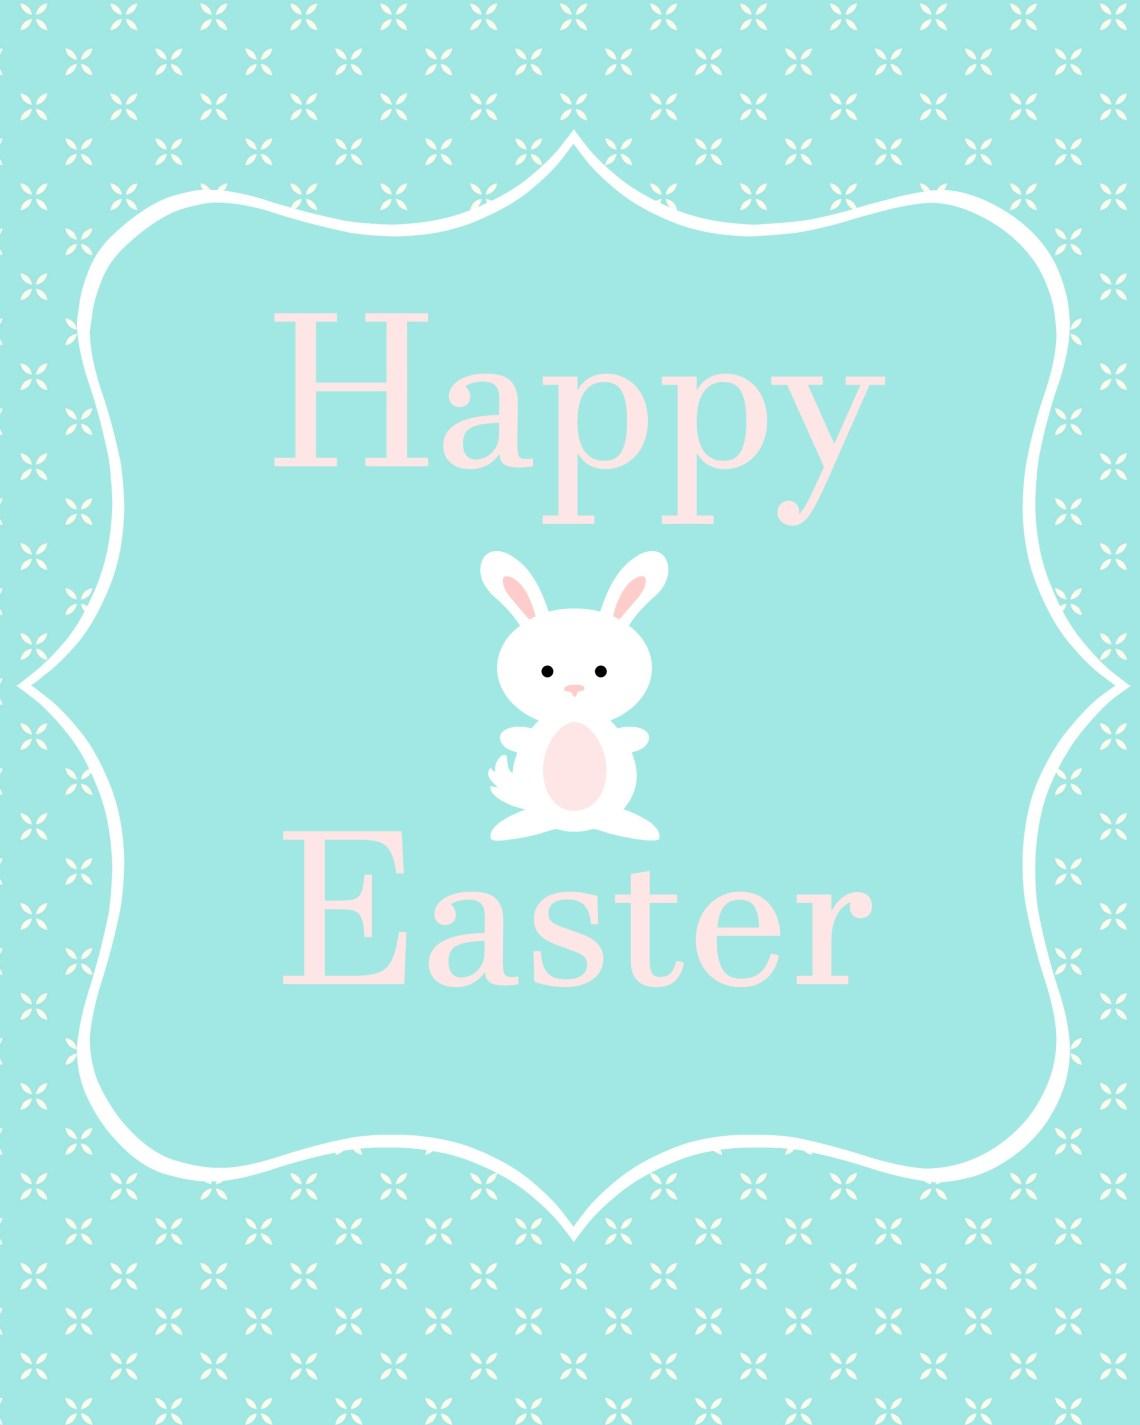 Happy Easter printable